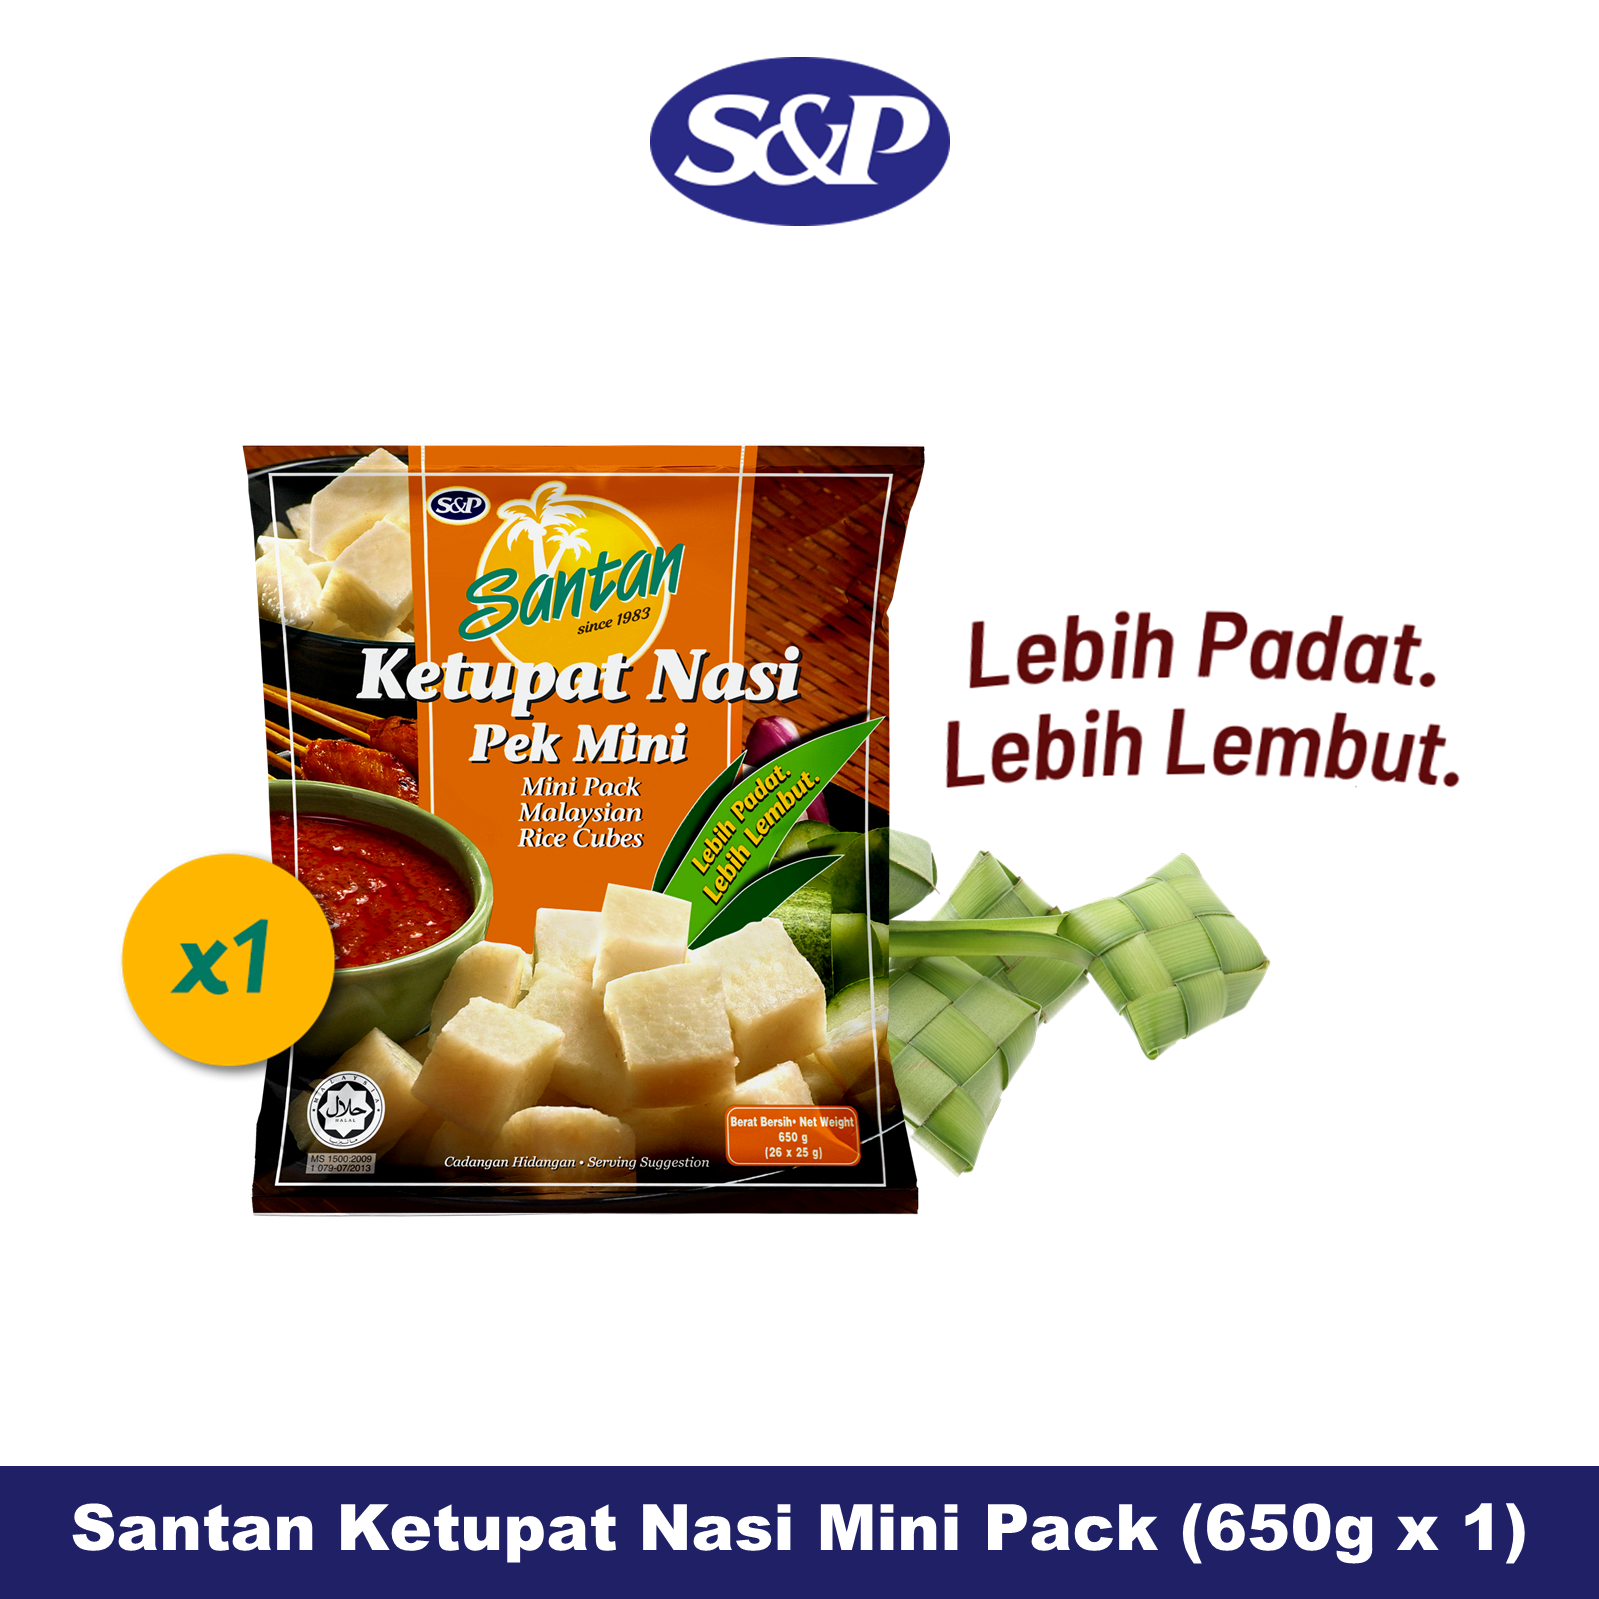 S&P Santan Rice Dumpling MINI PACK Ketupat Nasi (650g)